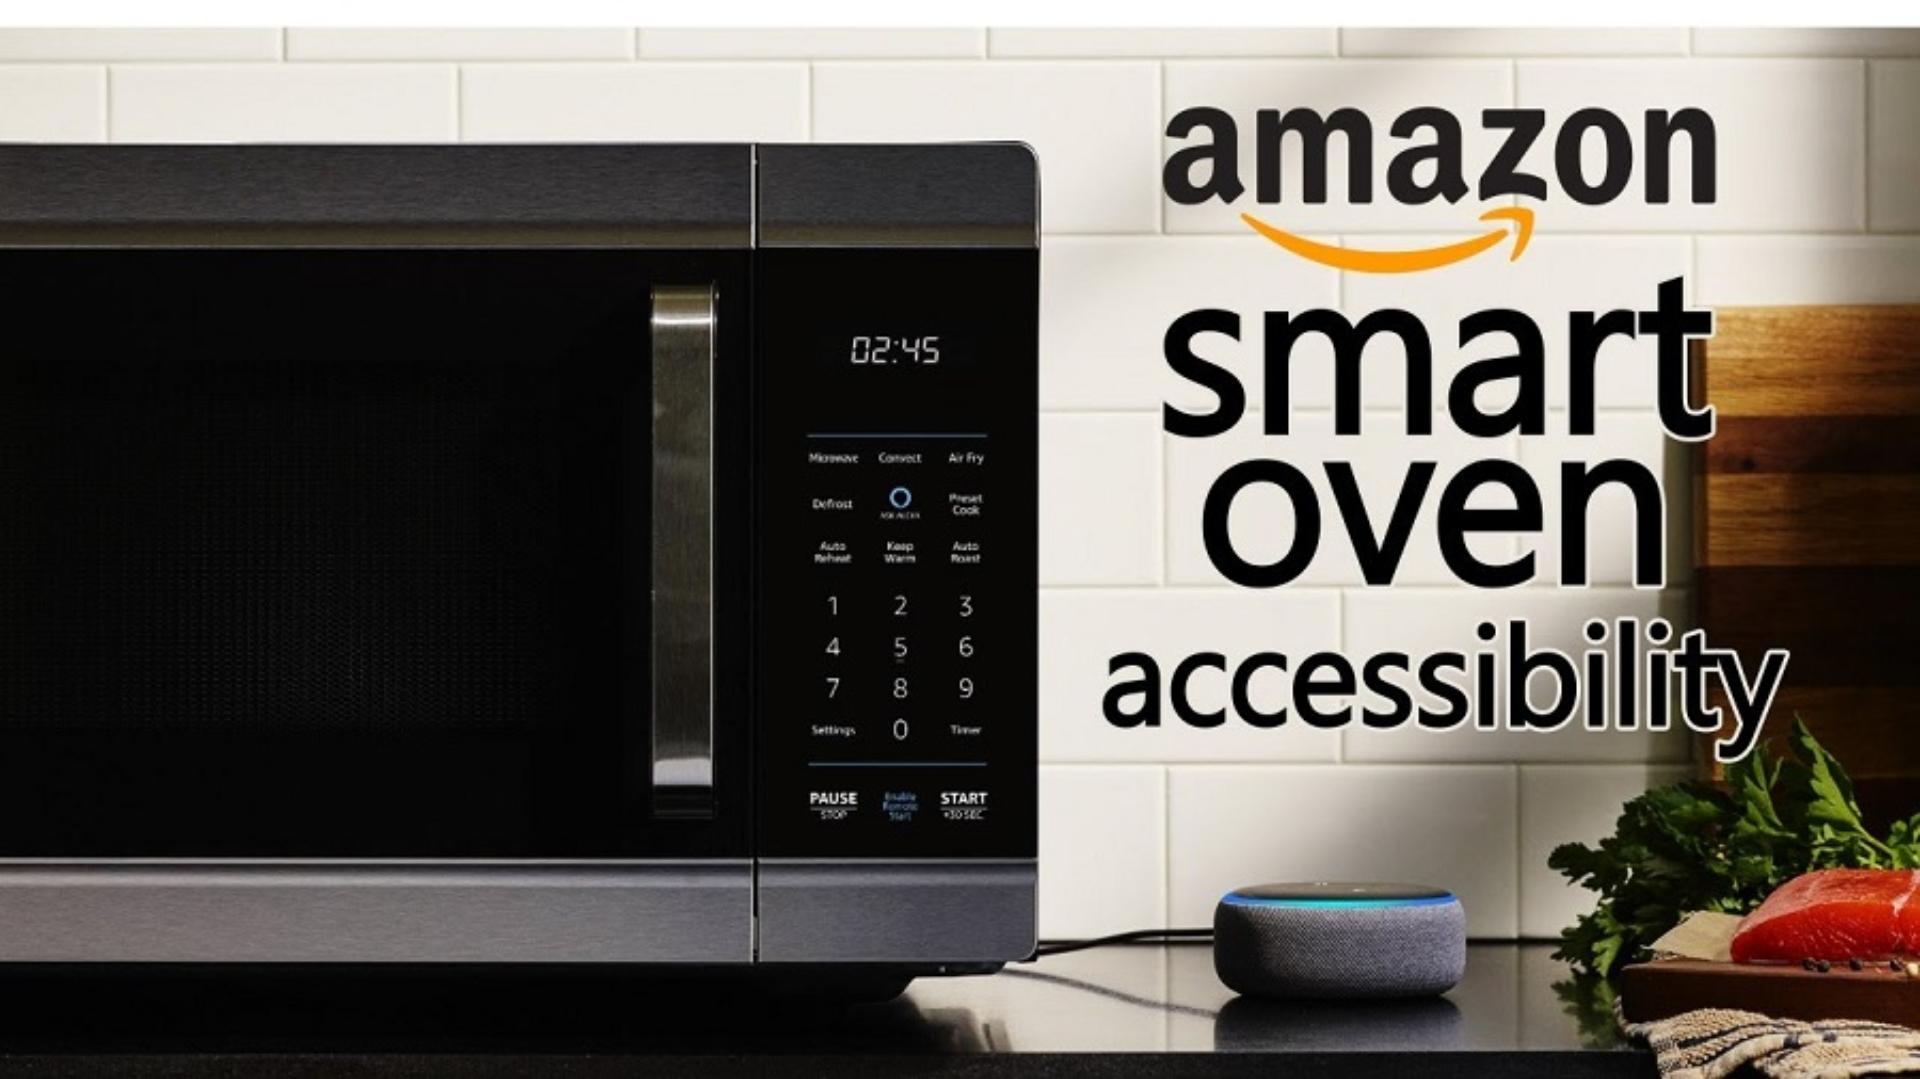 Amazon Smart Oven accessibility